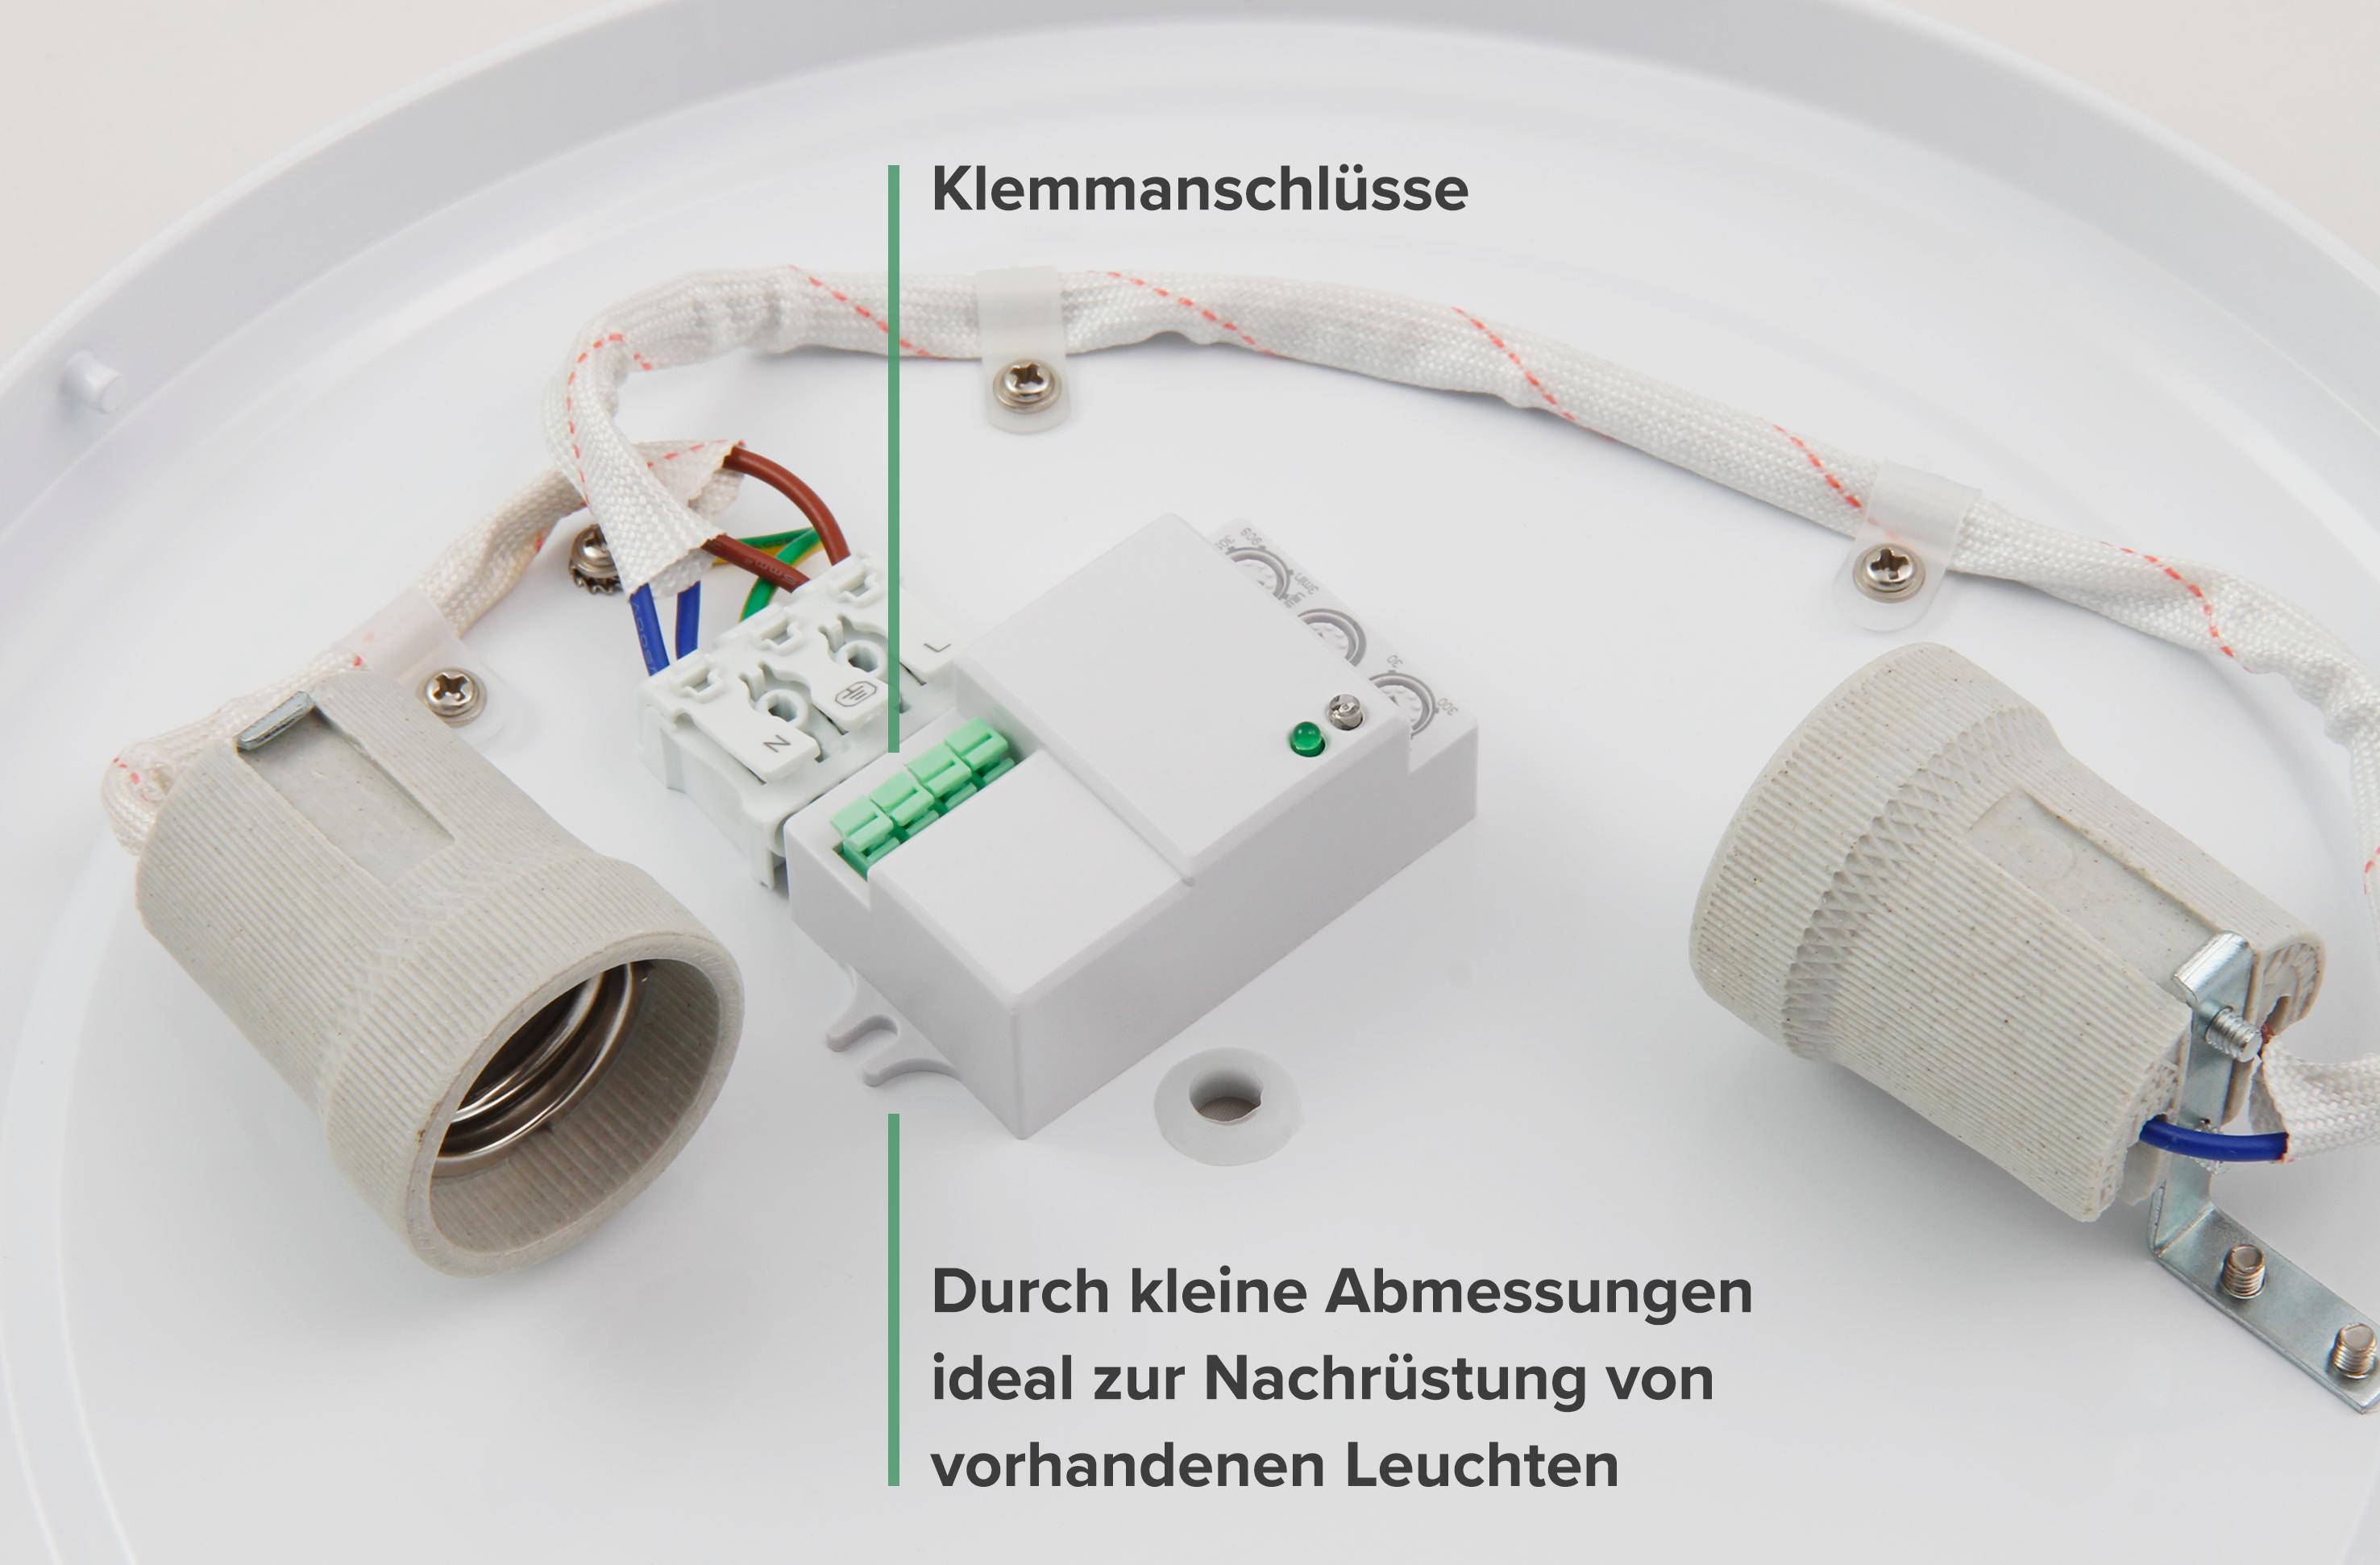 HF / Mikrowellen-Bewegungsmelder McShine ''LX-701C'', 360°, 230V / 1.200W, weiß, LED geeignet